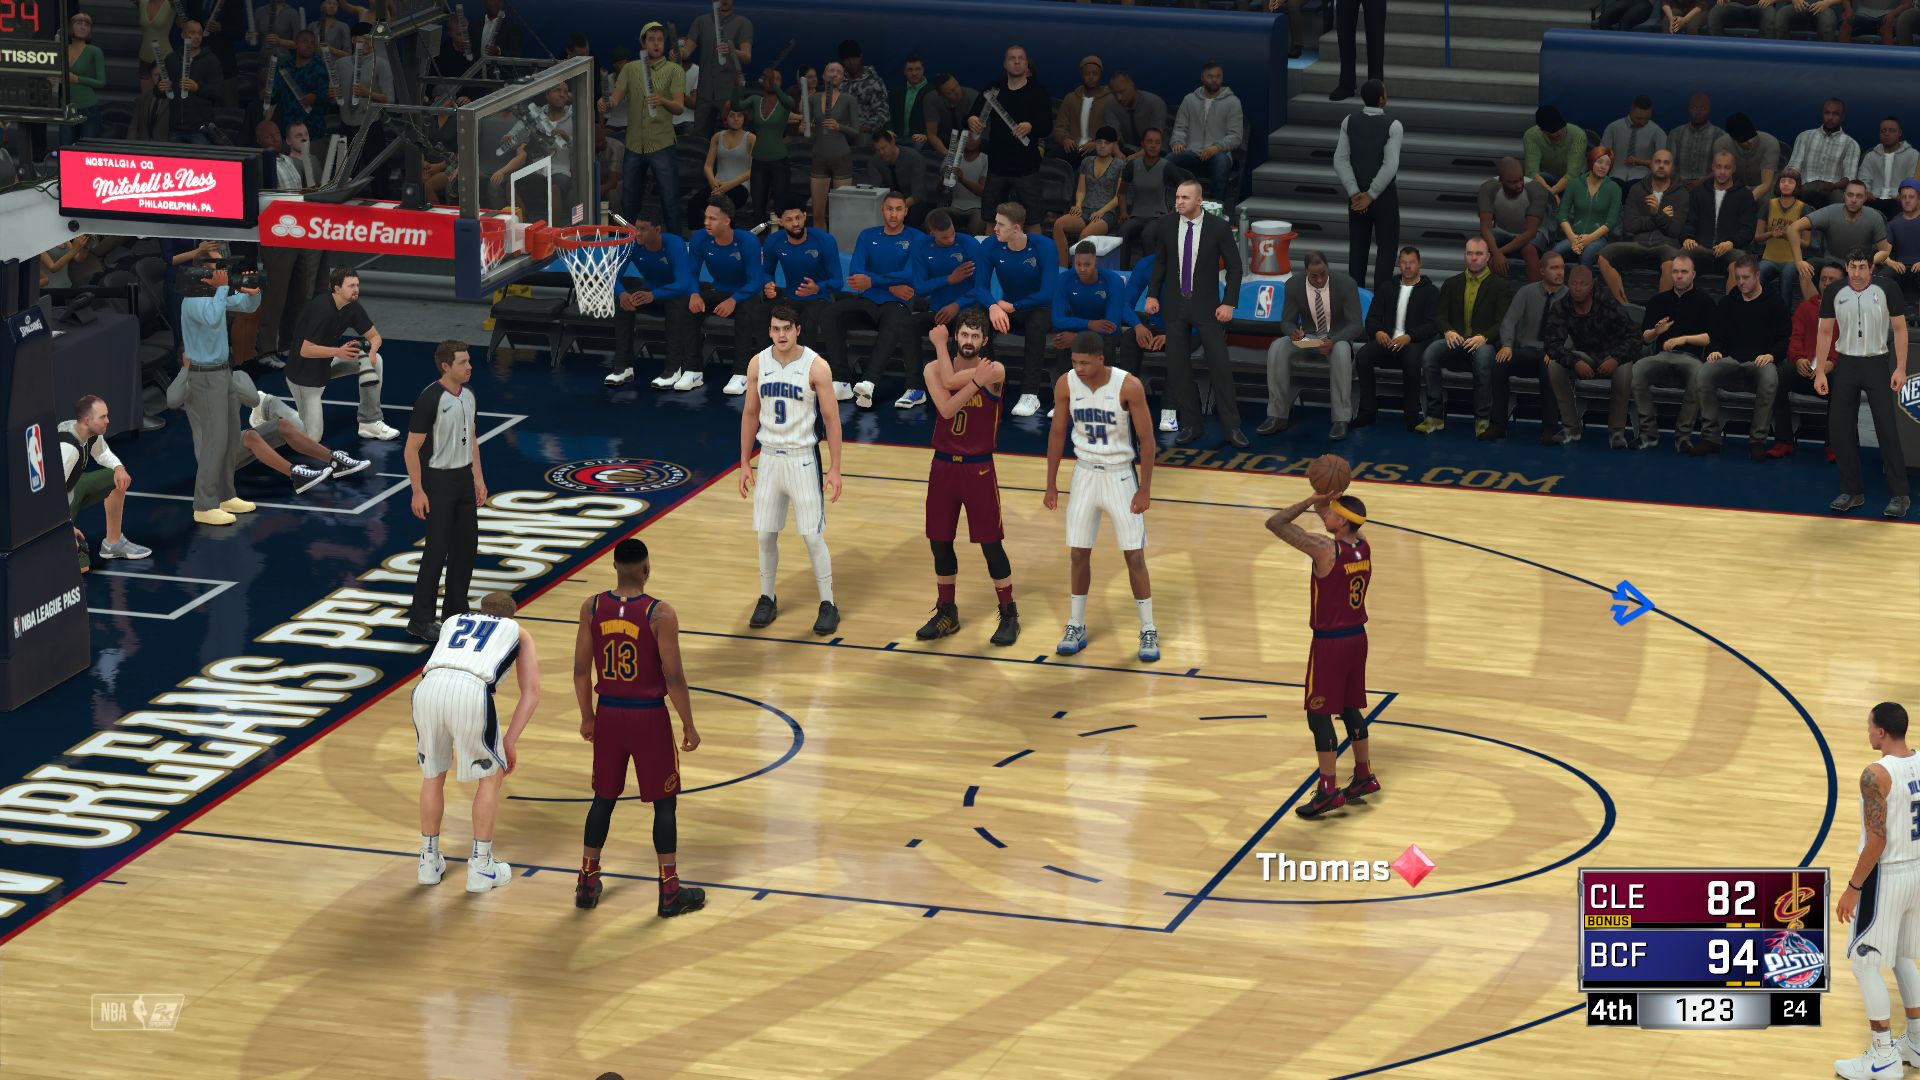 NBA 2K18 – basketbal s prvky MMO 151754